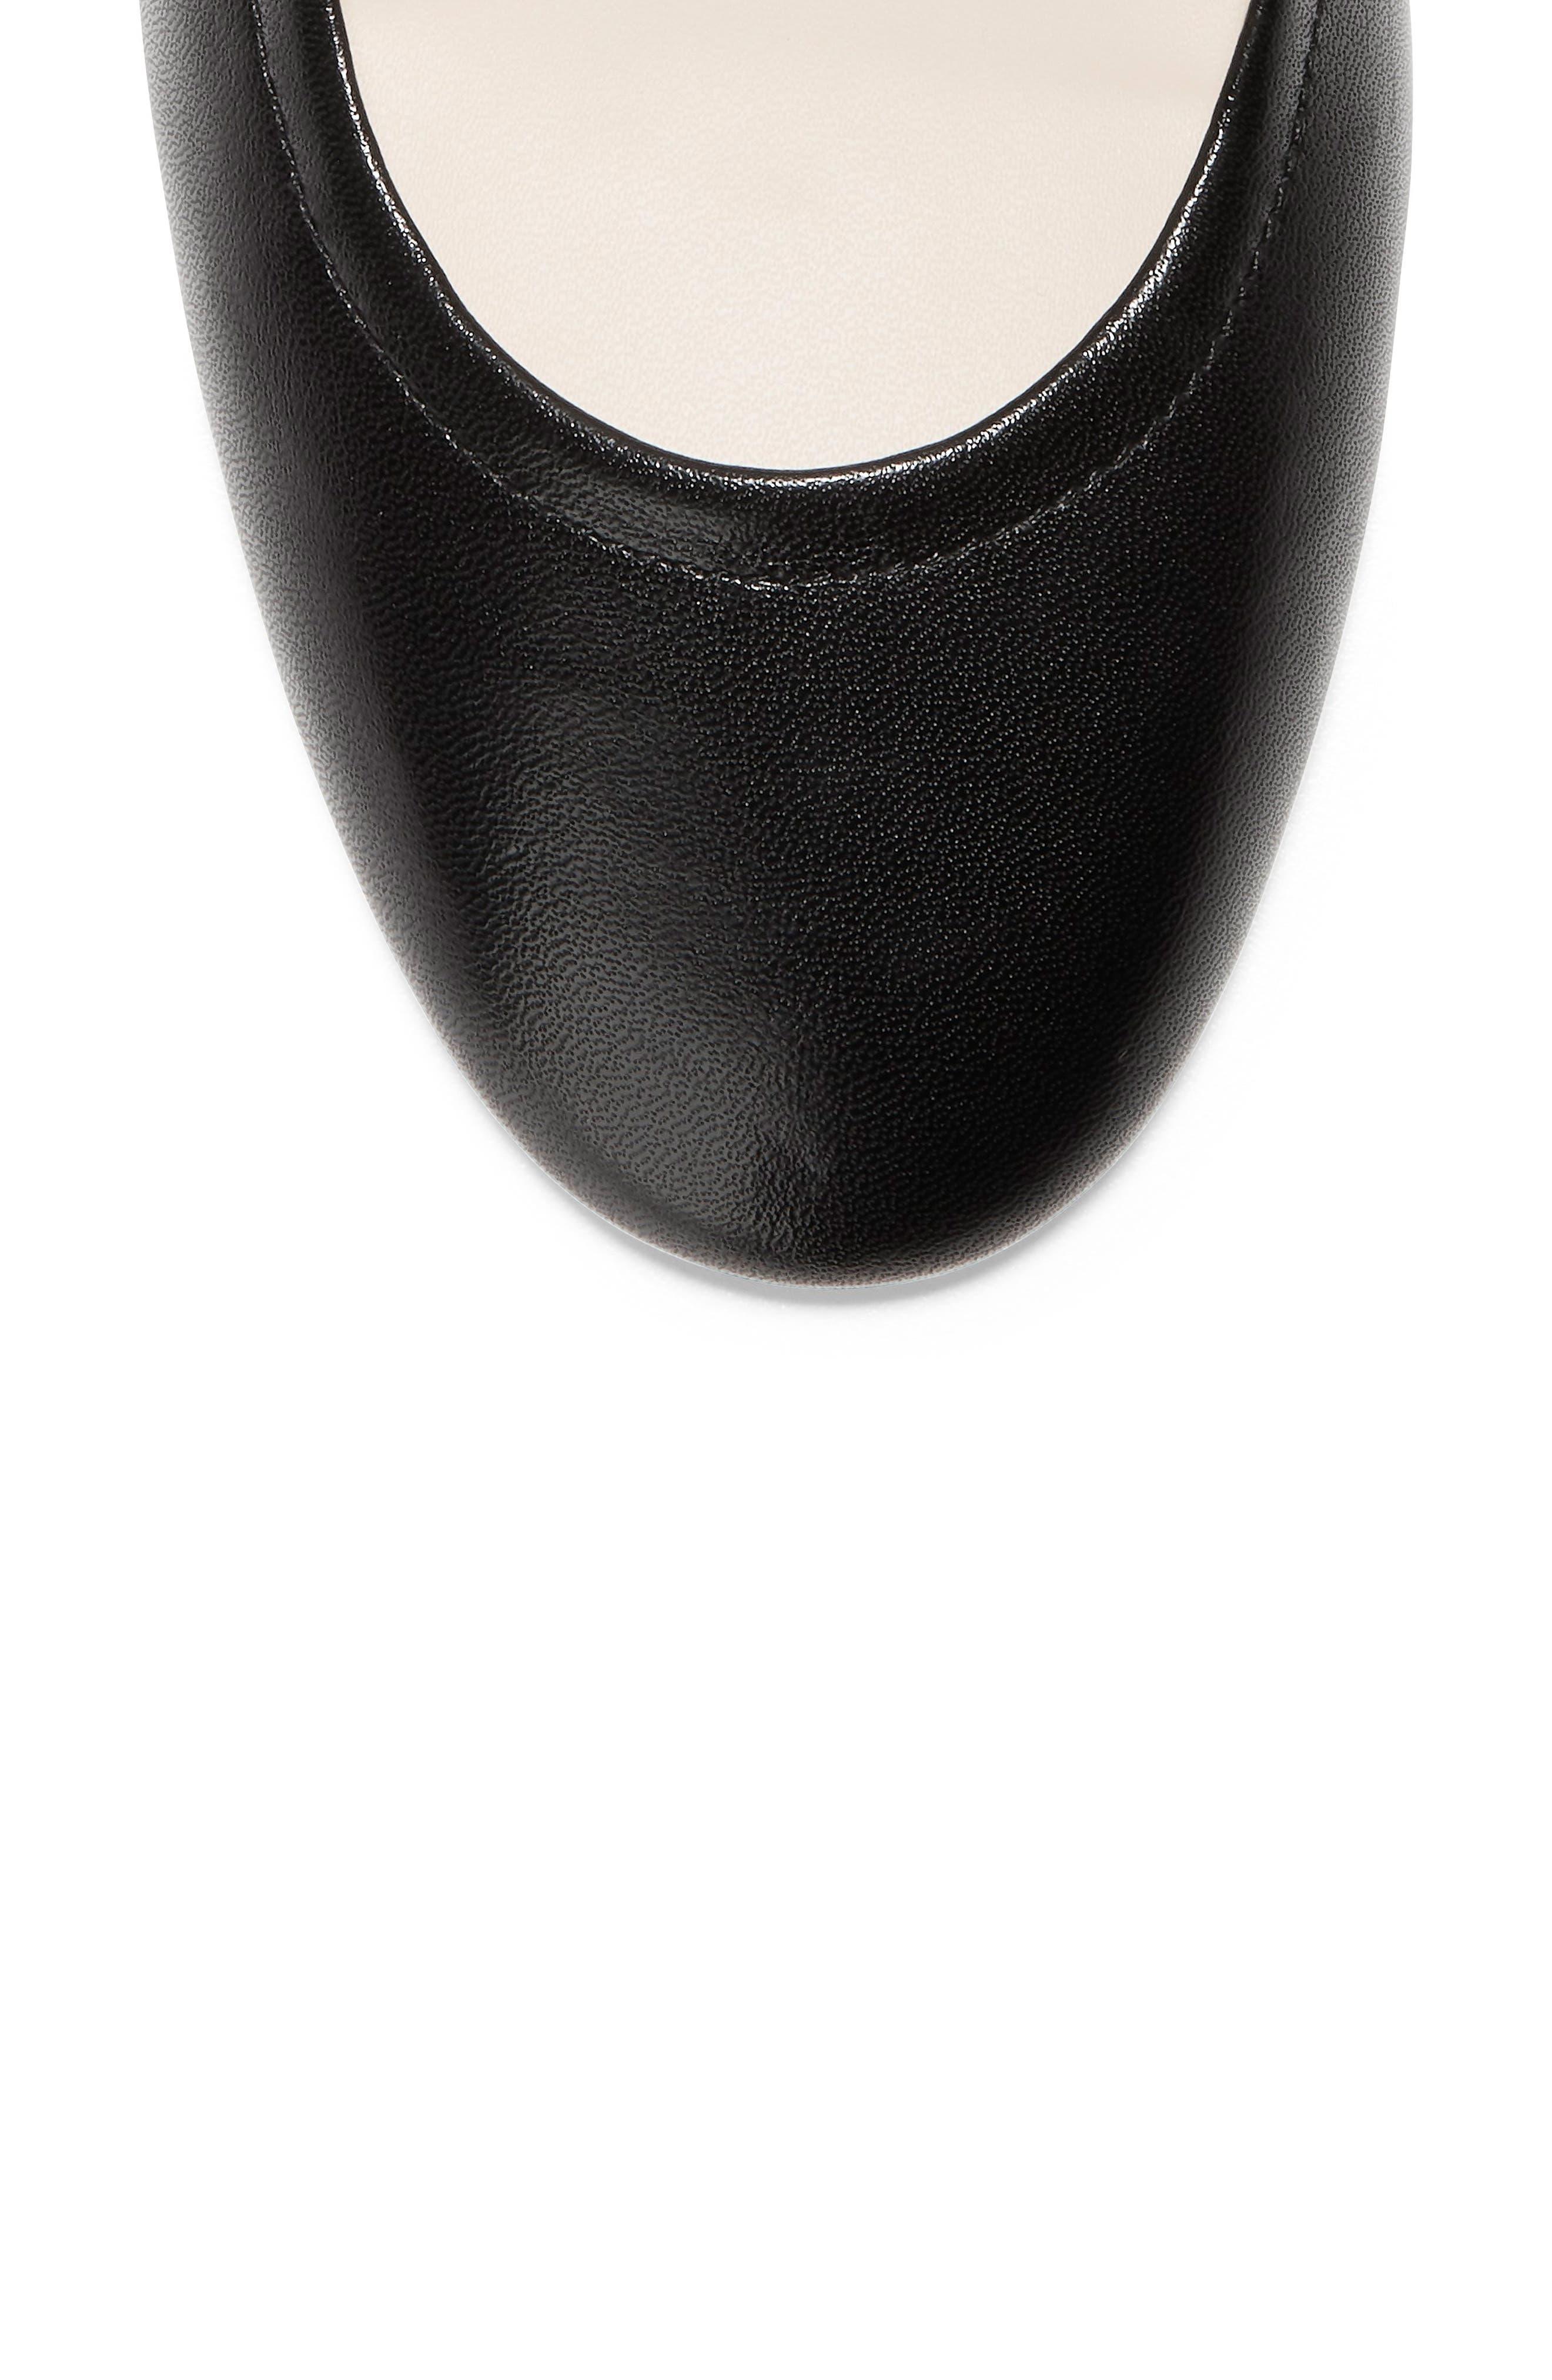 COLE HAAN, Avianna Pump, Alternate thumbnail 7, color, BLACK LEATHER